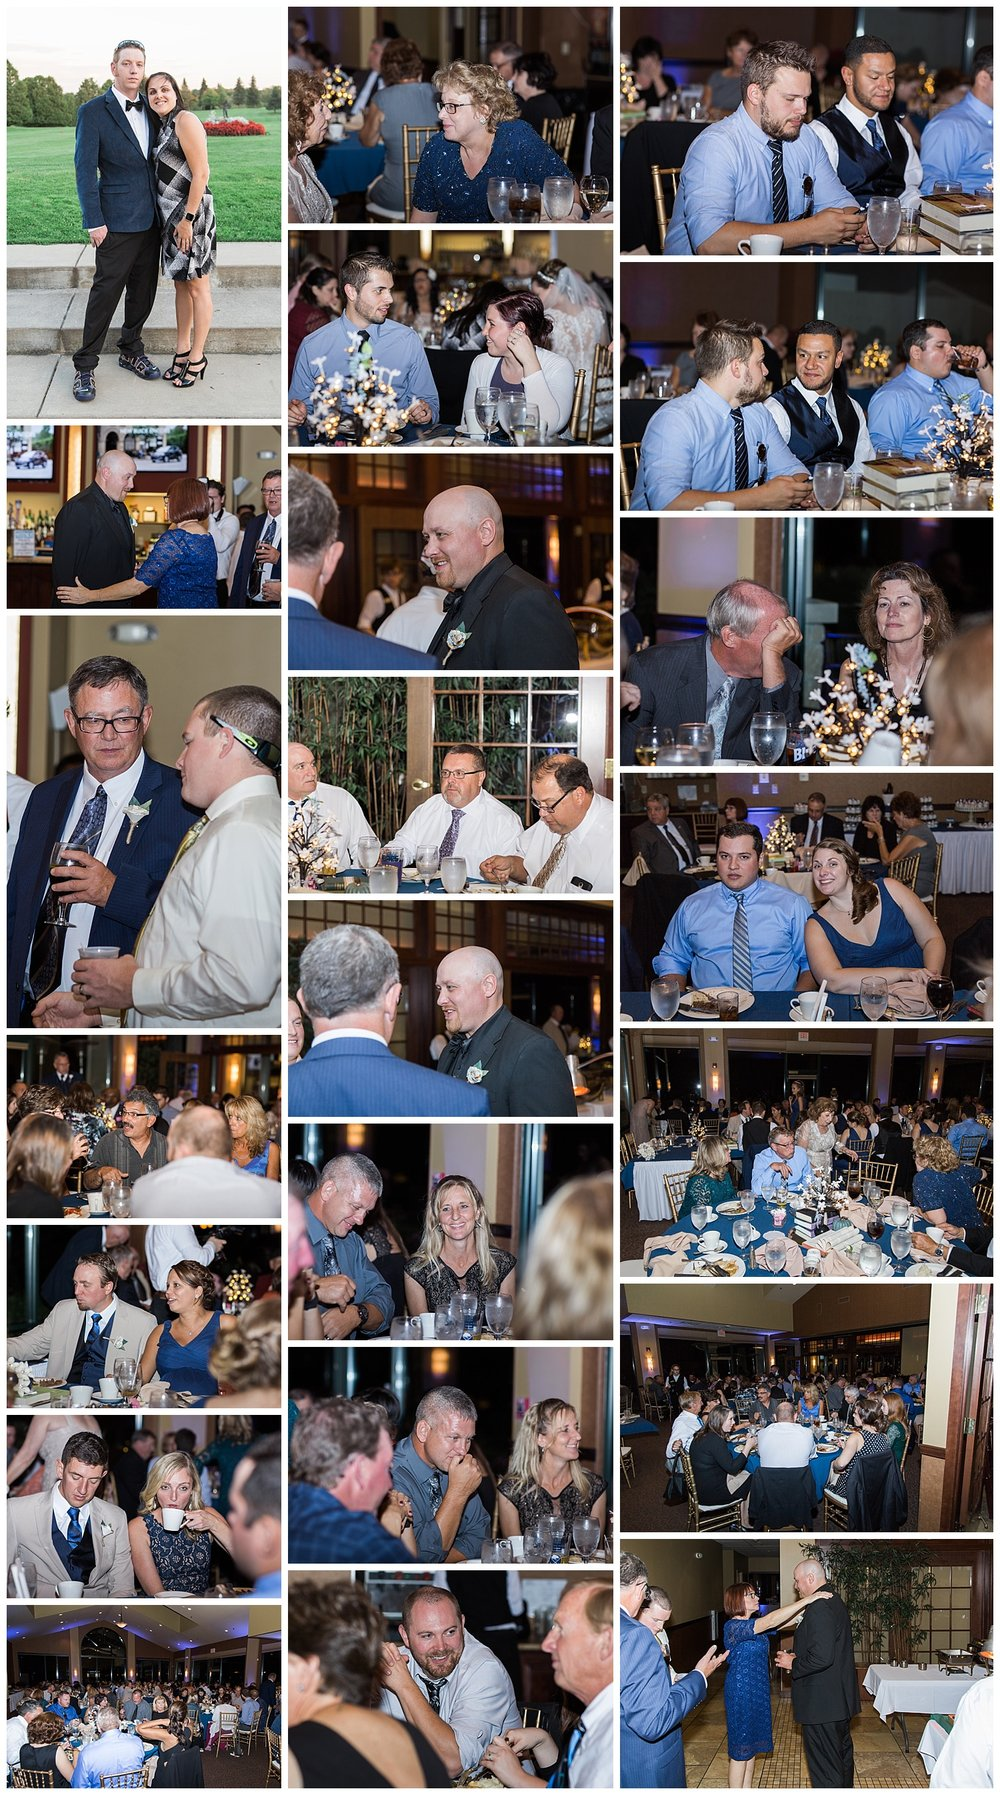 Jessica and Scott McKay - Terry Hills Golf Course - Batavia NY - Lass and Beau-1056_Buffalo wedding photography.jpg